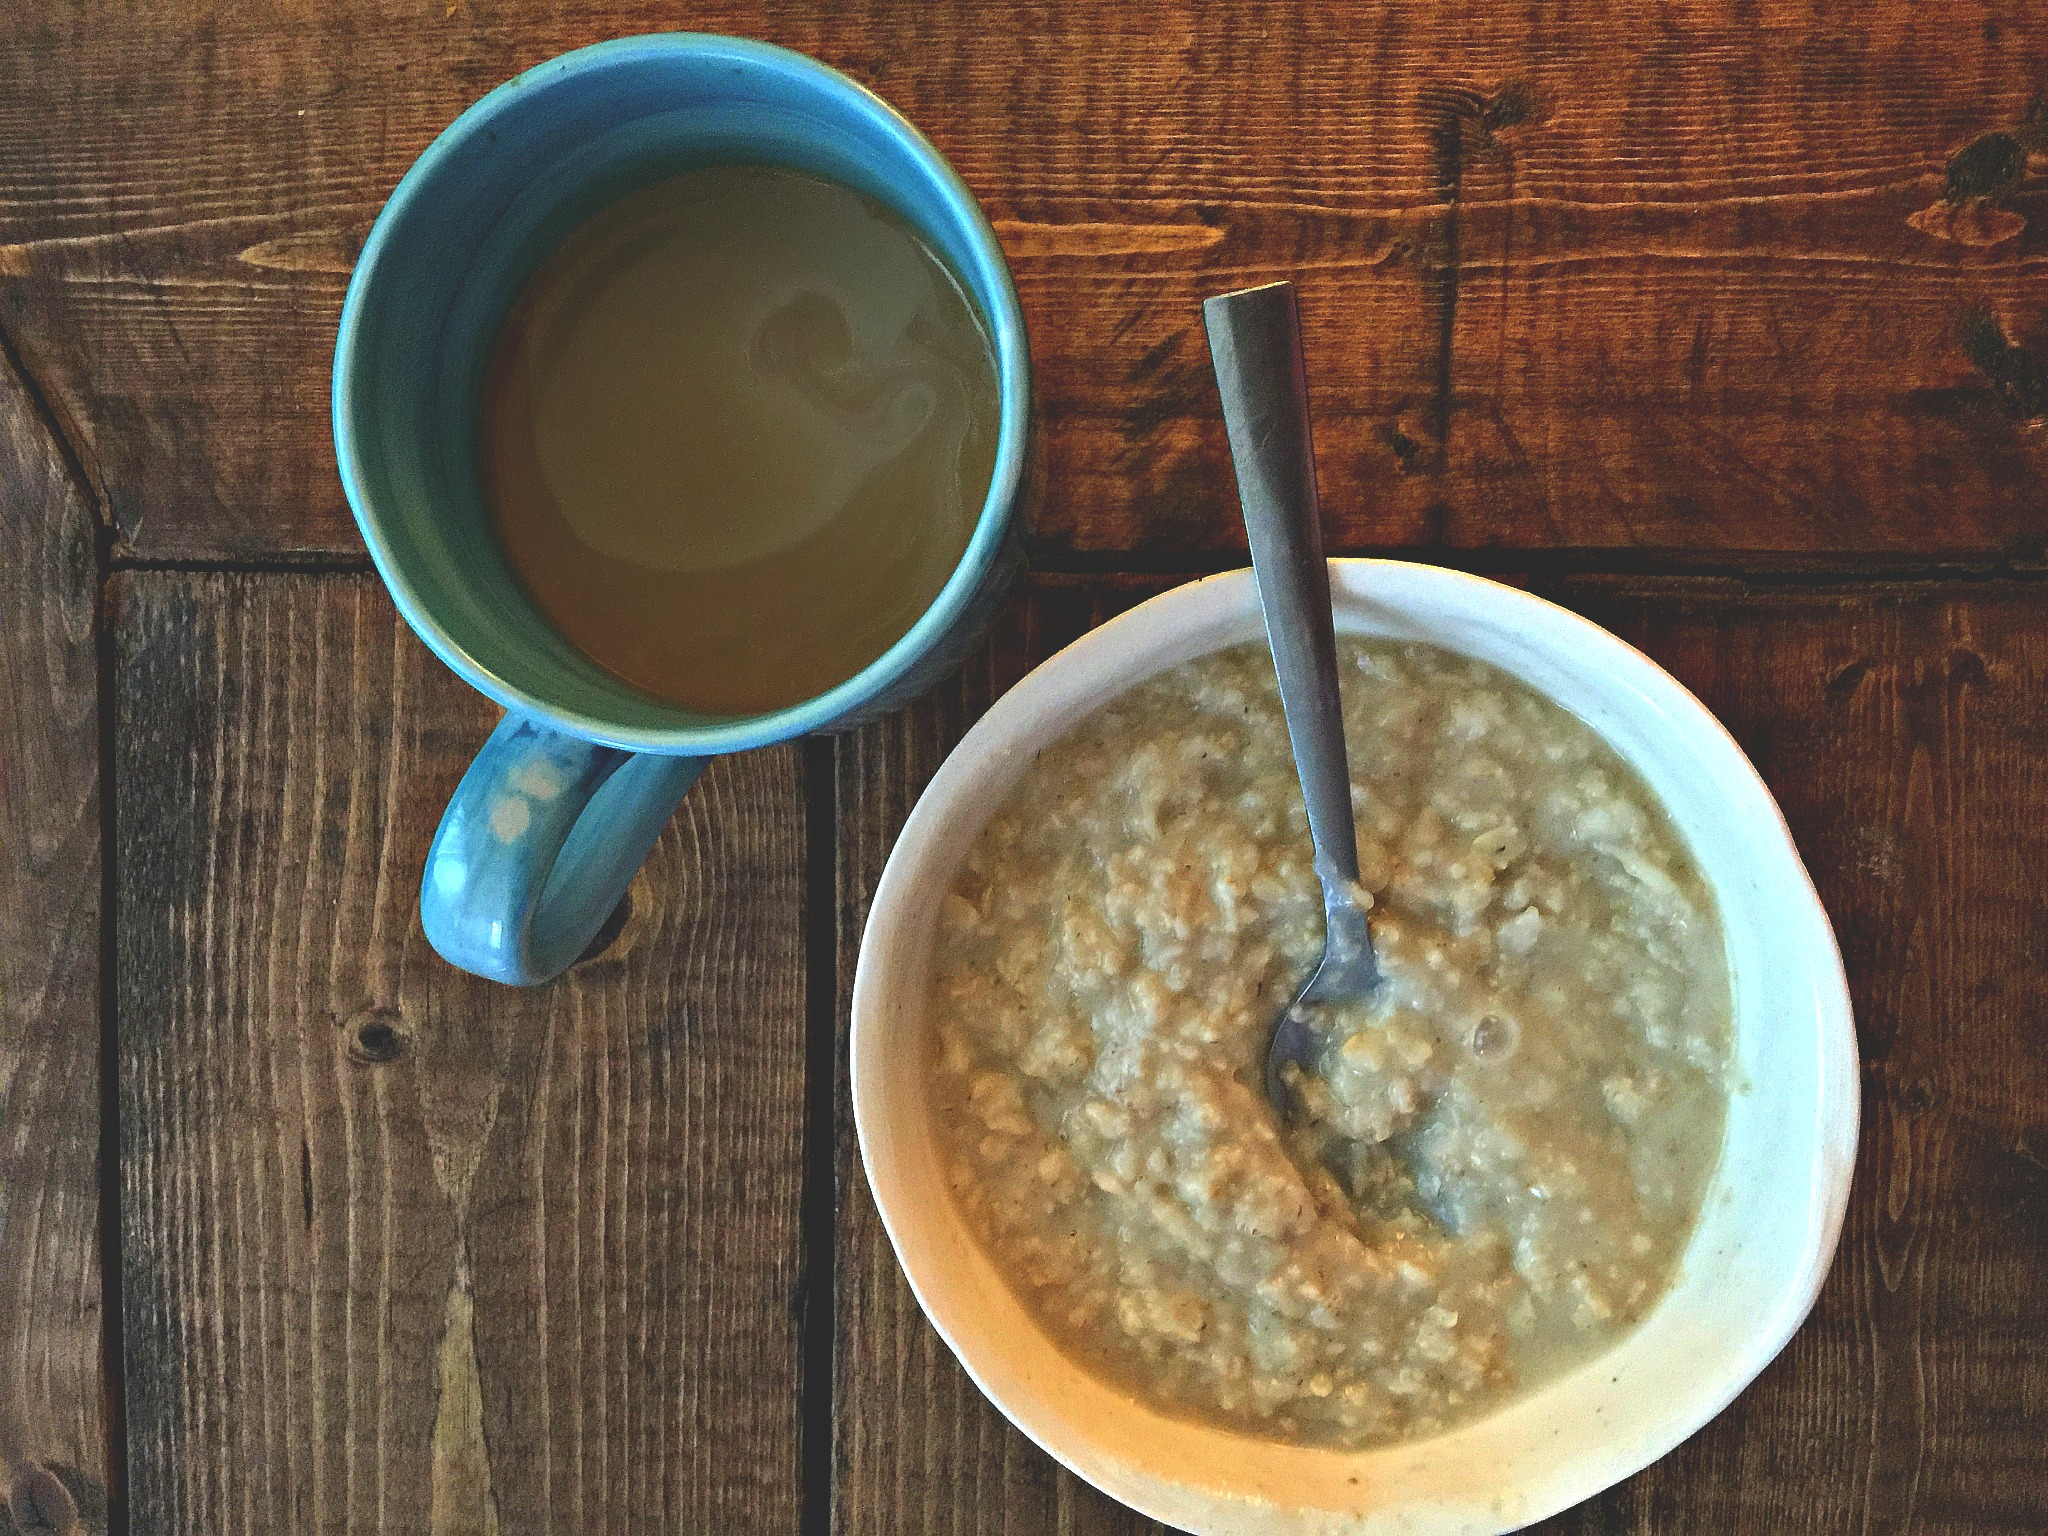 Oatmeal & Coffee with Simply Taralynn